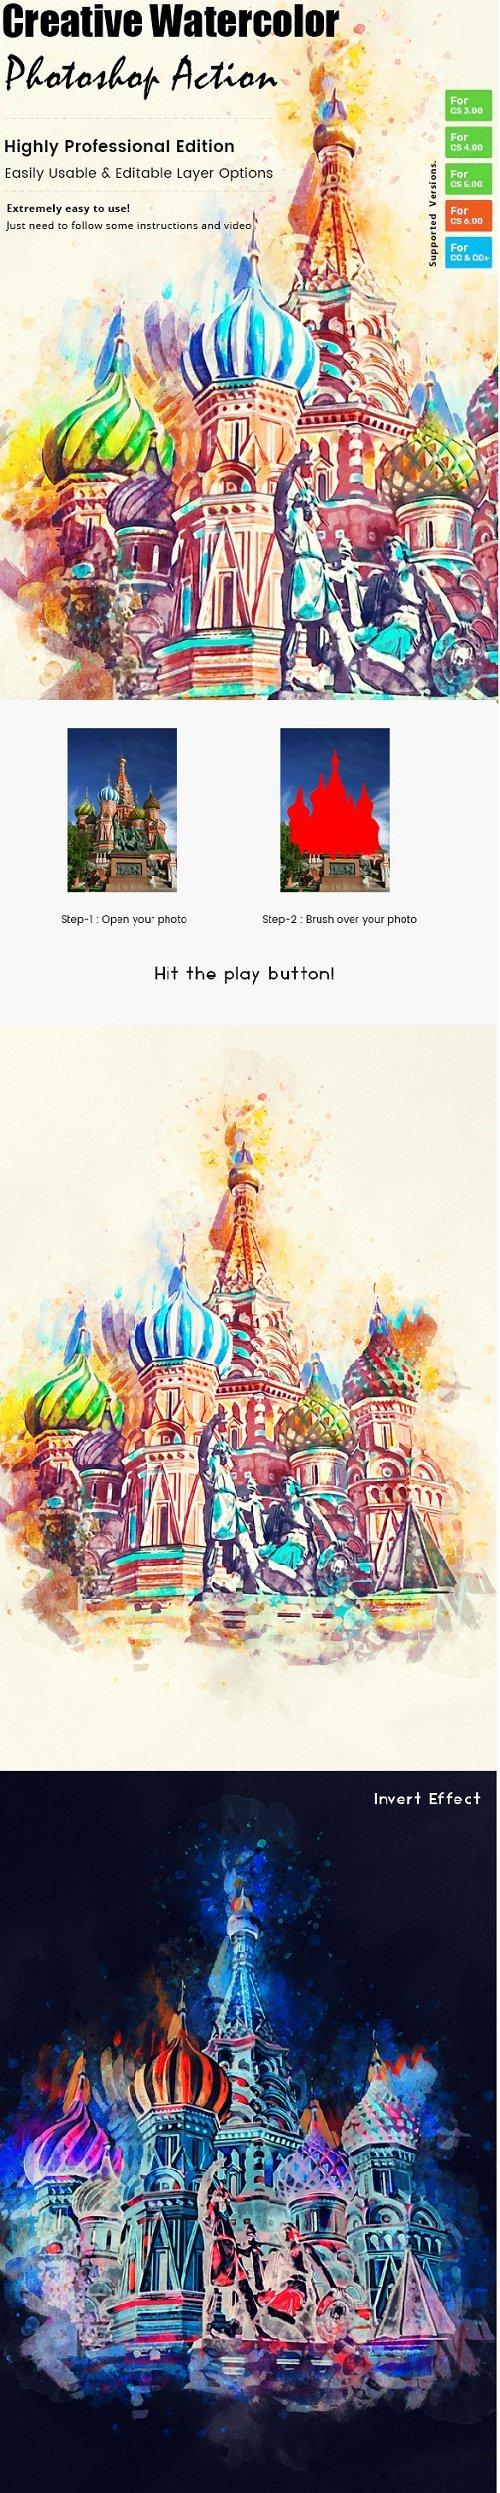 Creative Watercolor Paint Action 23224470